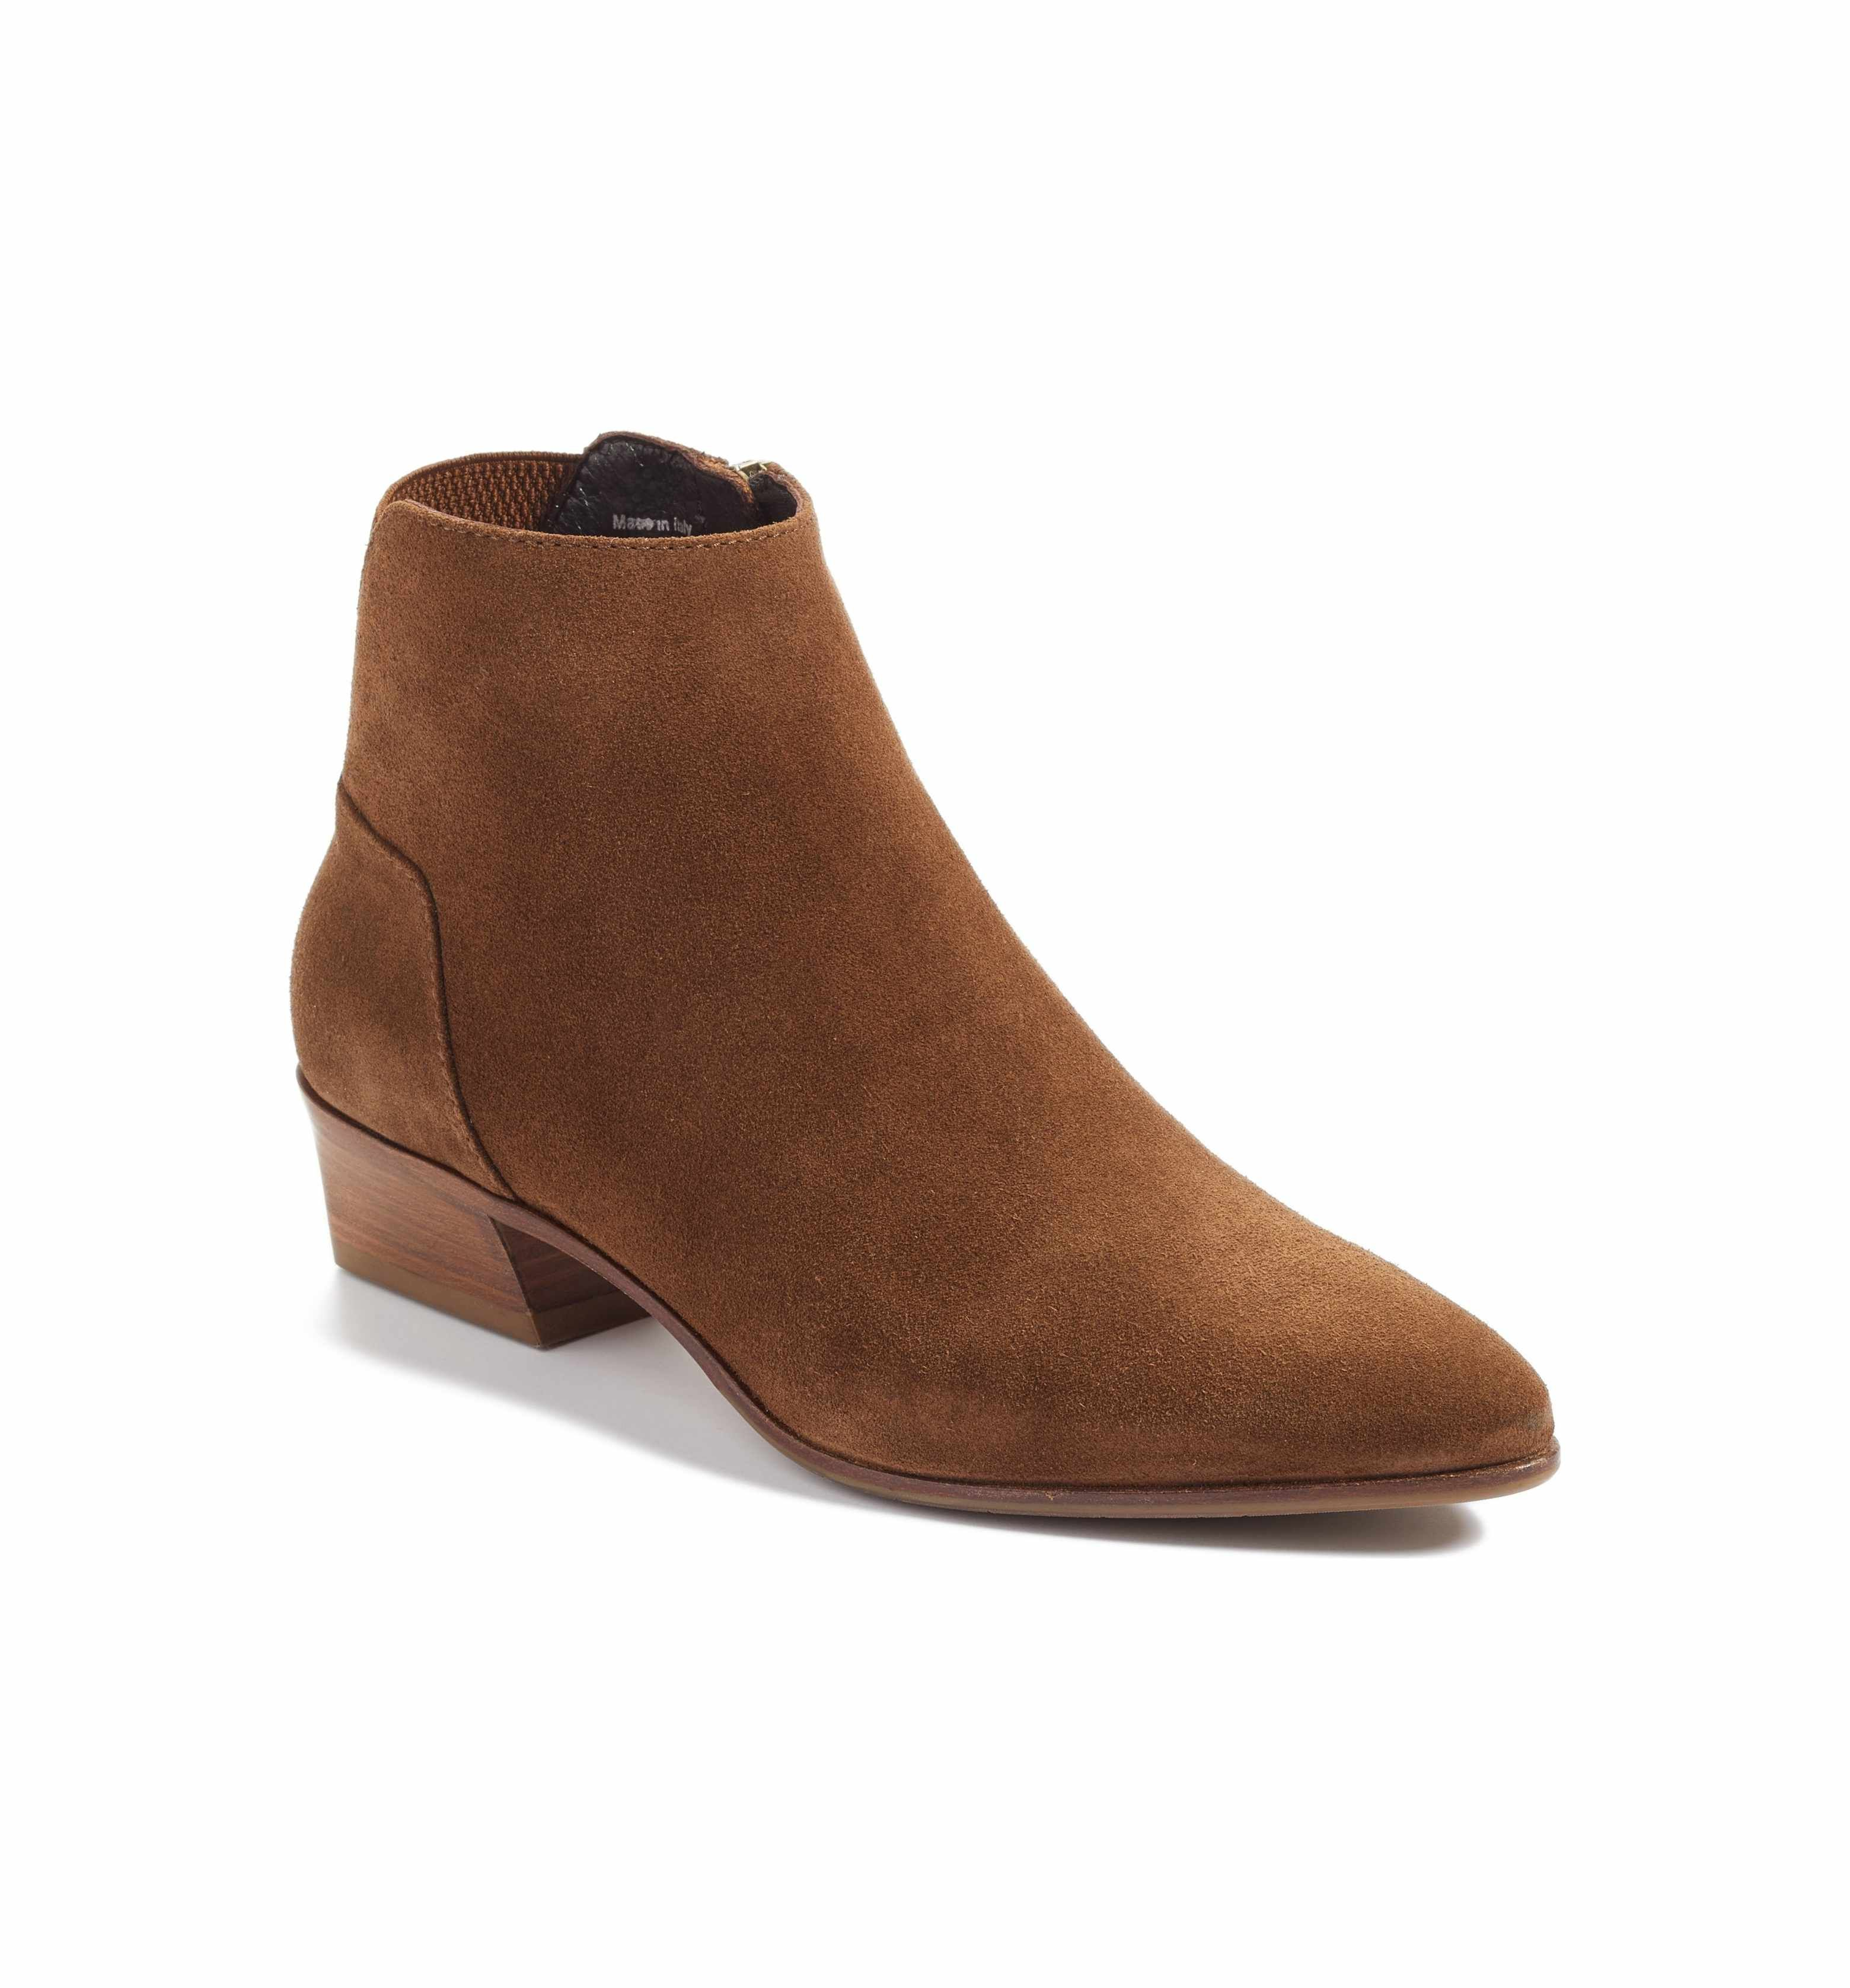 Aquatalia Franca Suede Ankle Boots discount tumblr HdDCR